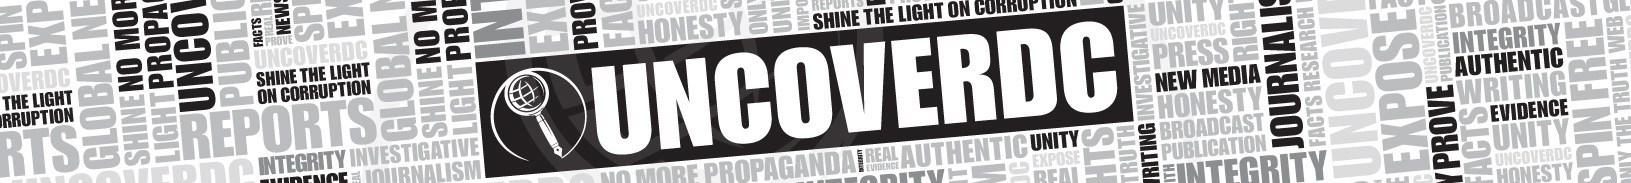 UncoverDC.com Lindell v. Dominion Journalism Roundup